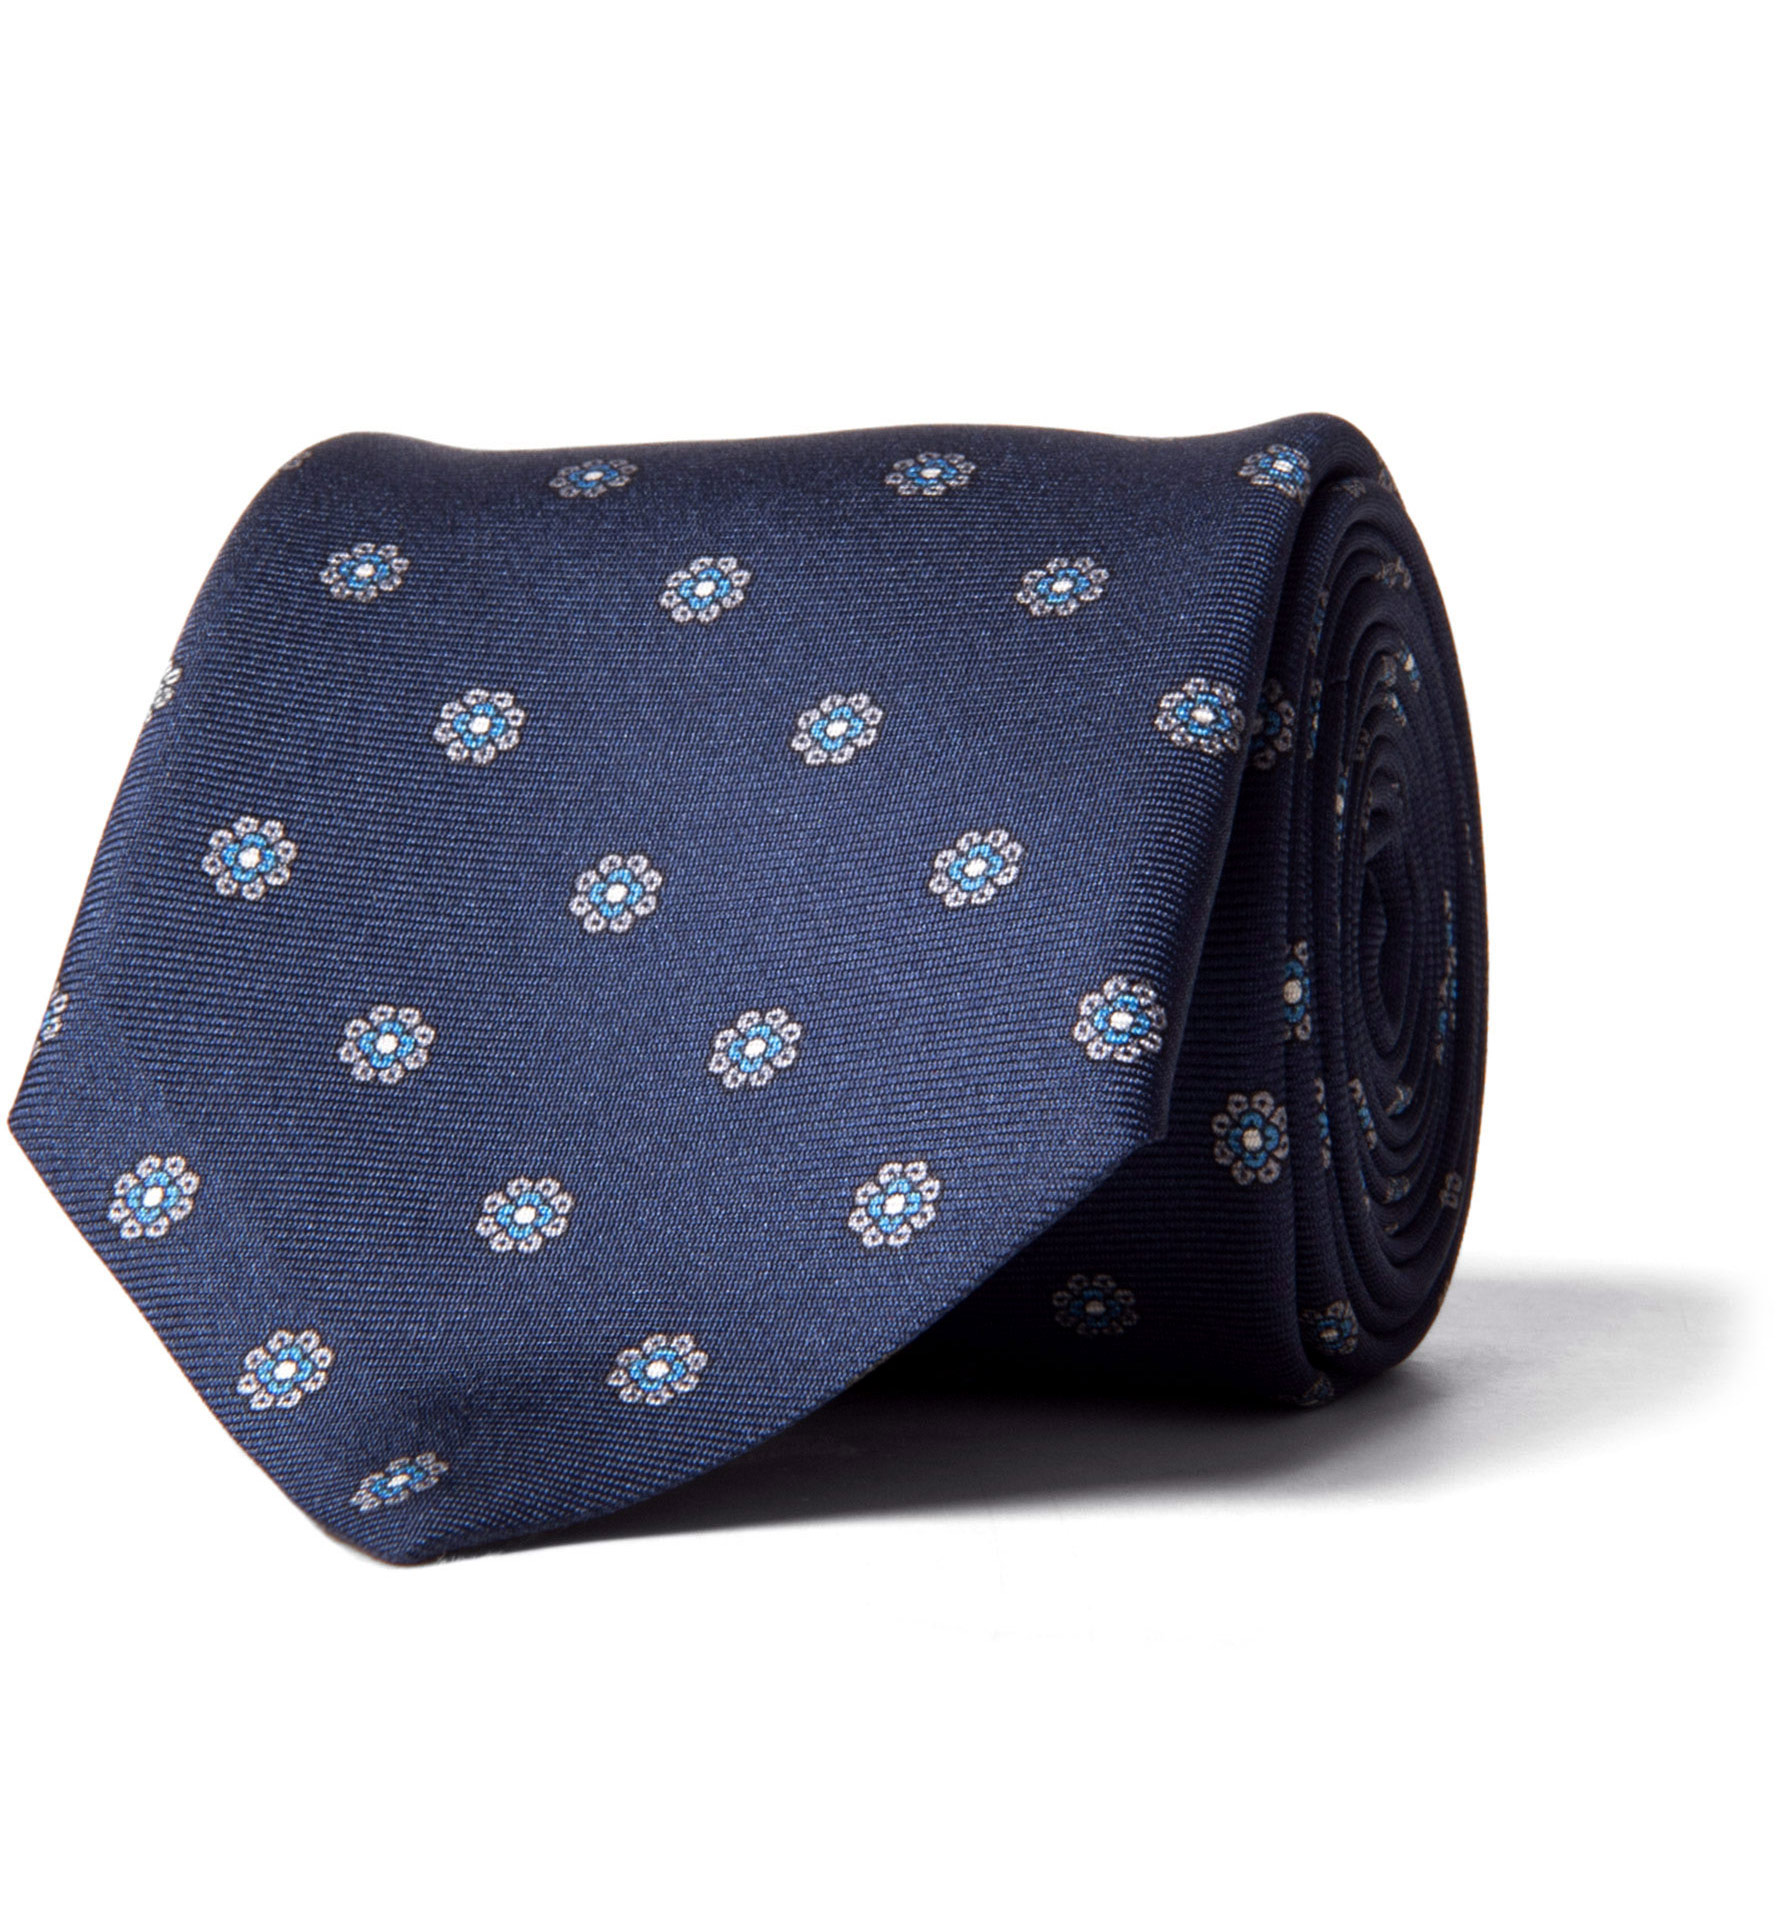 Zoom Image of Navy and Grey Silk Foulard Tie